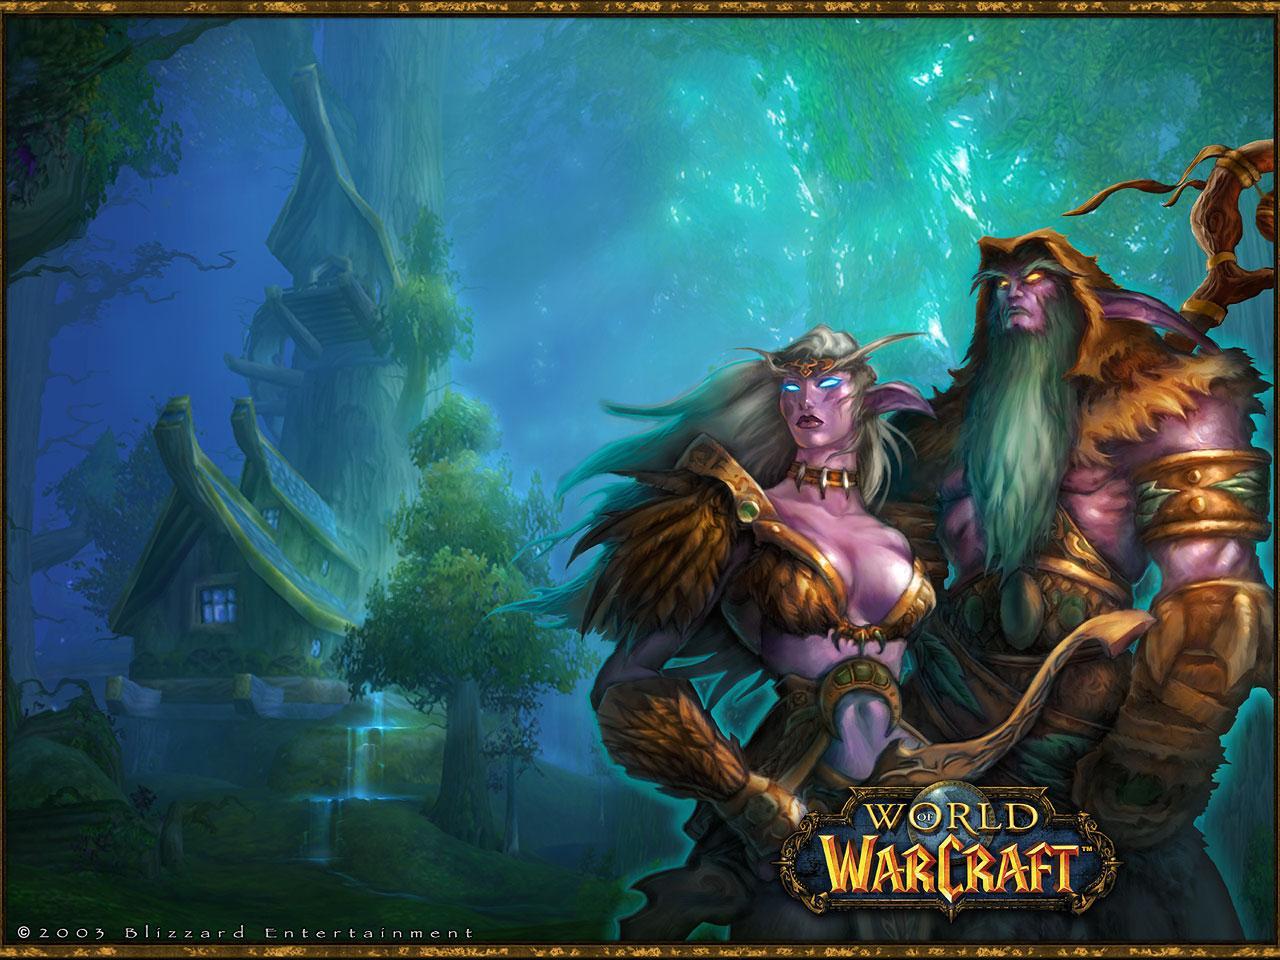 World Of Warcraft Mobile Wallpaper